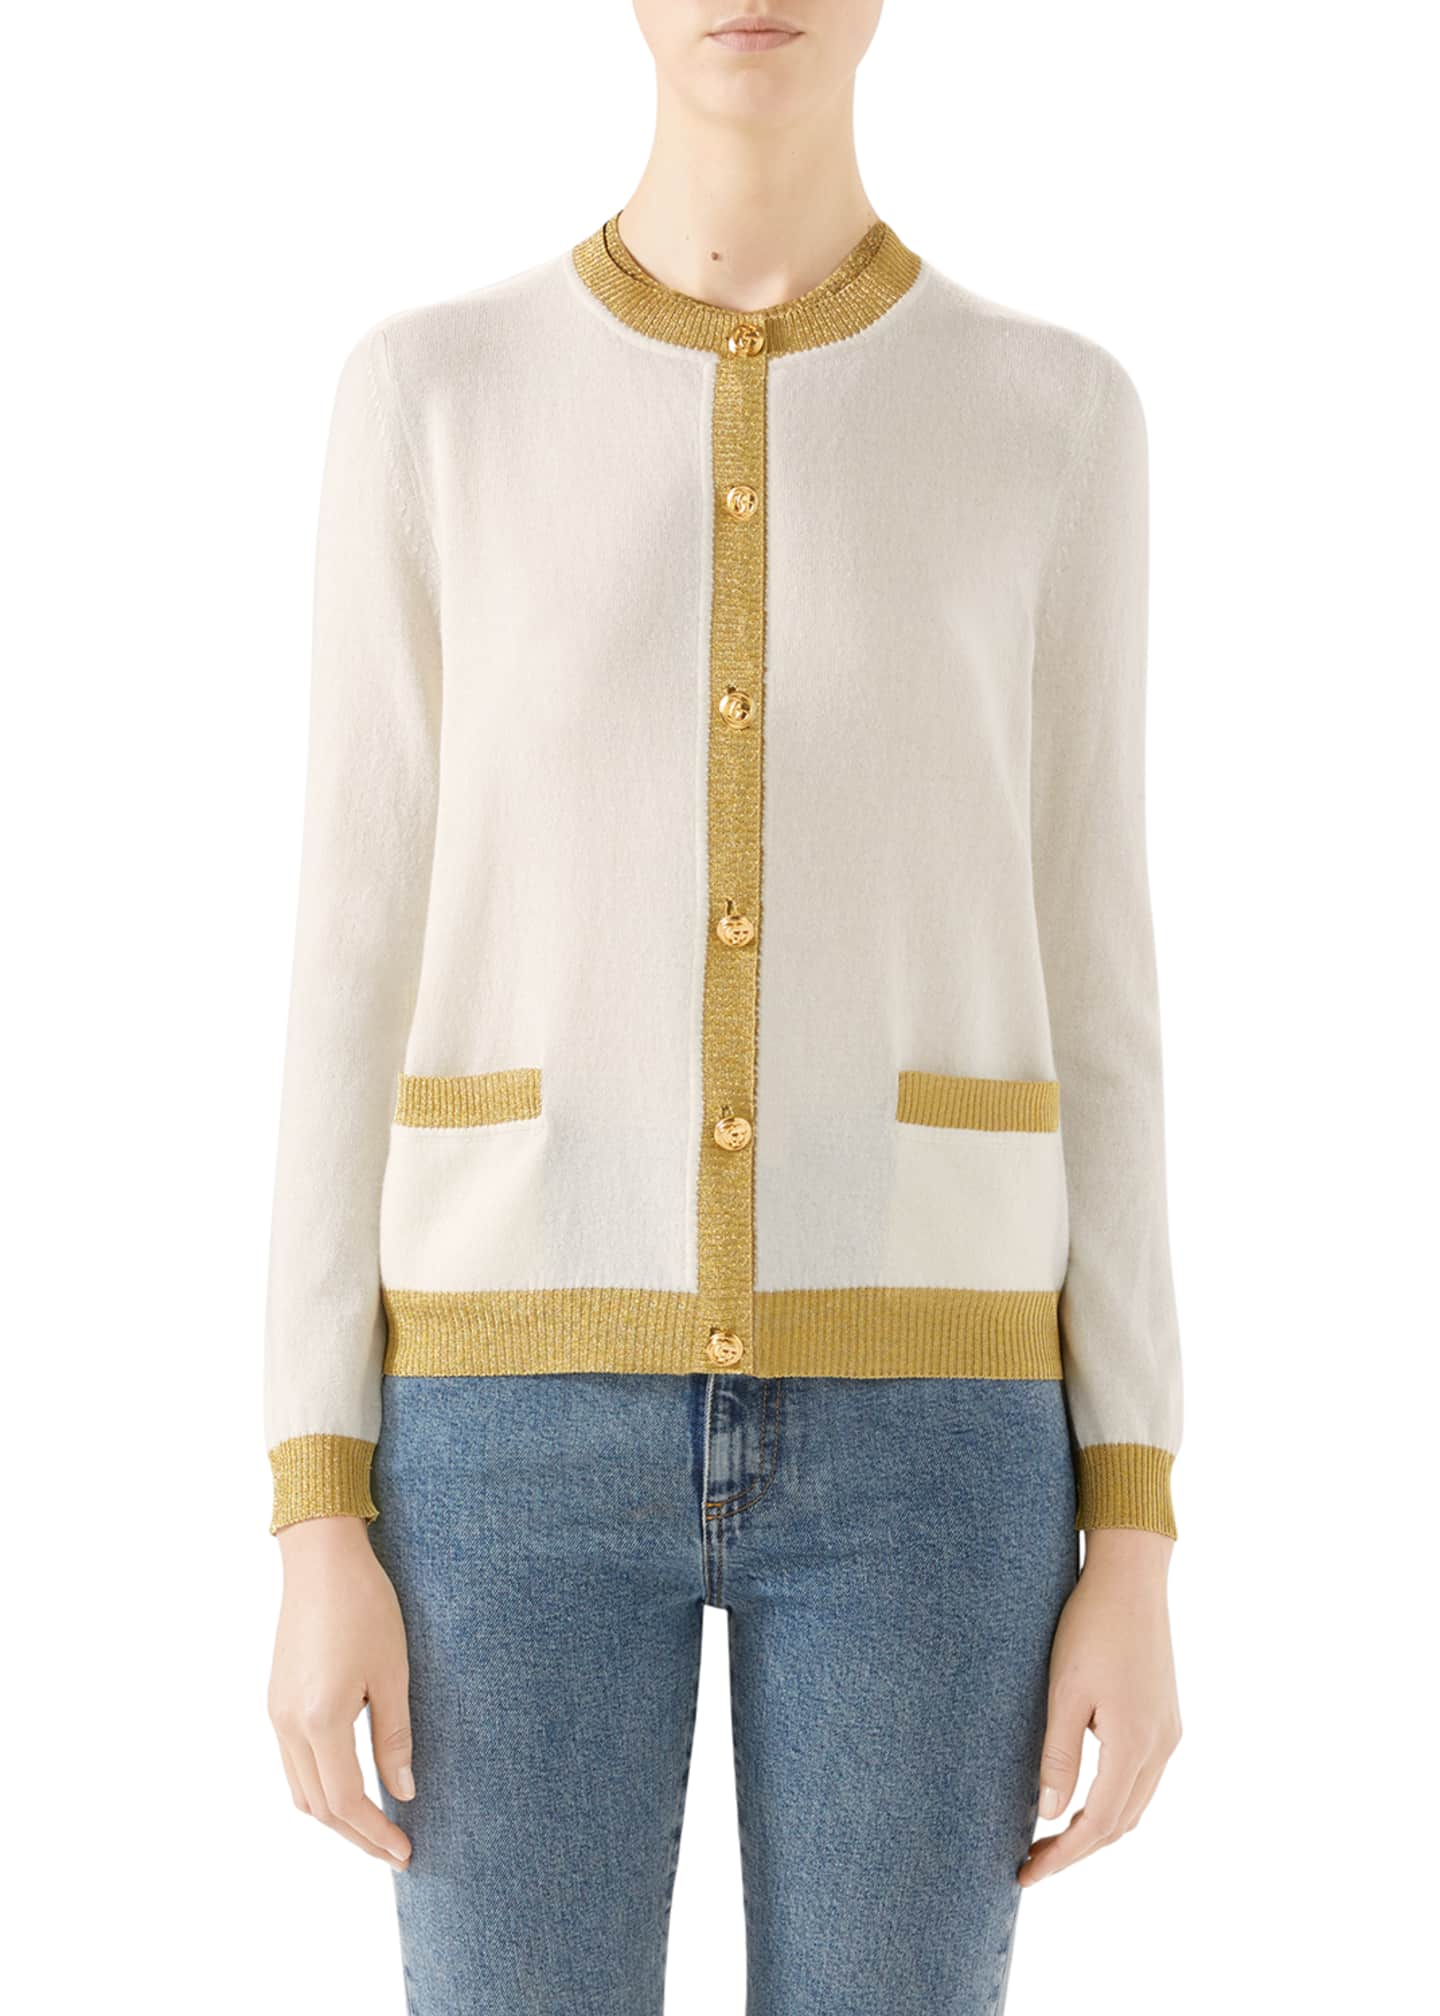 Gucci Cashmere-Silk Button-Front Cardigan